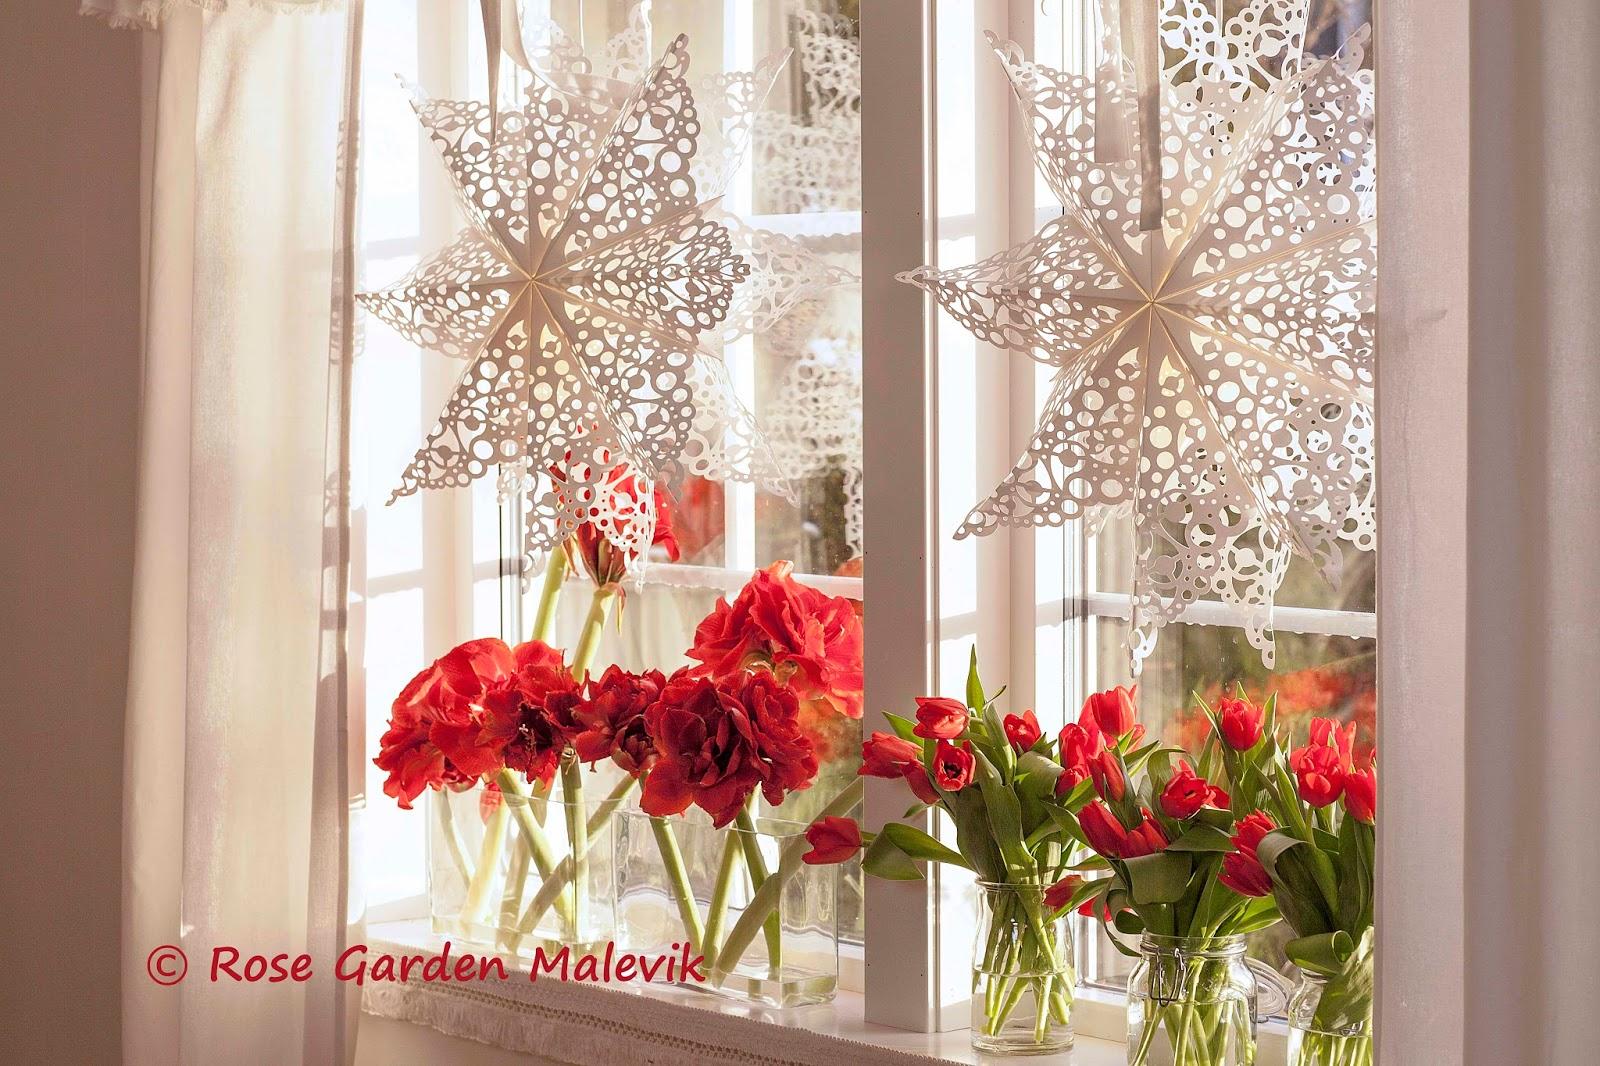 Rose garden malevik: det magiska ljuset ~ the magic light